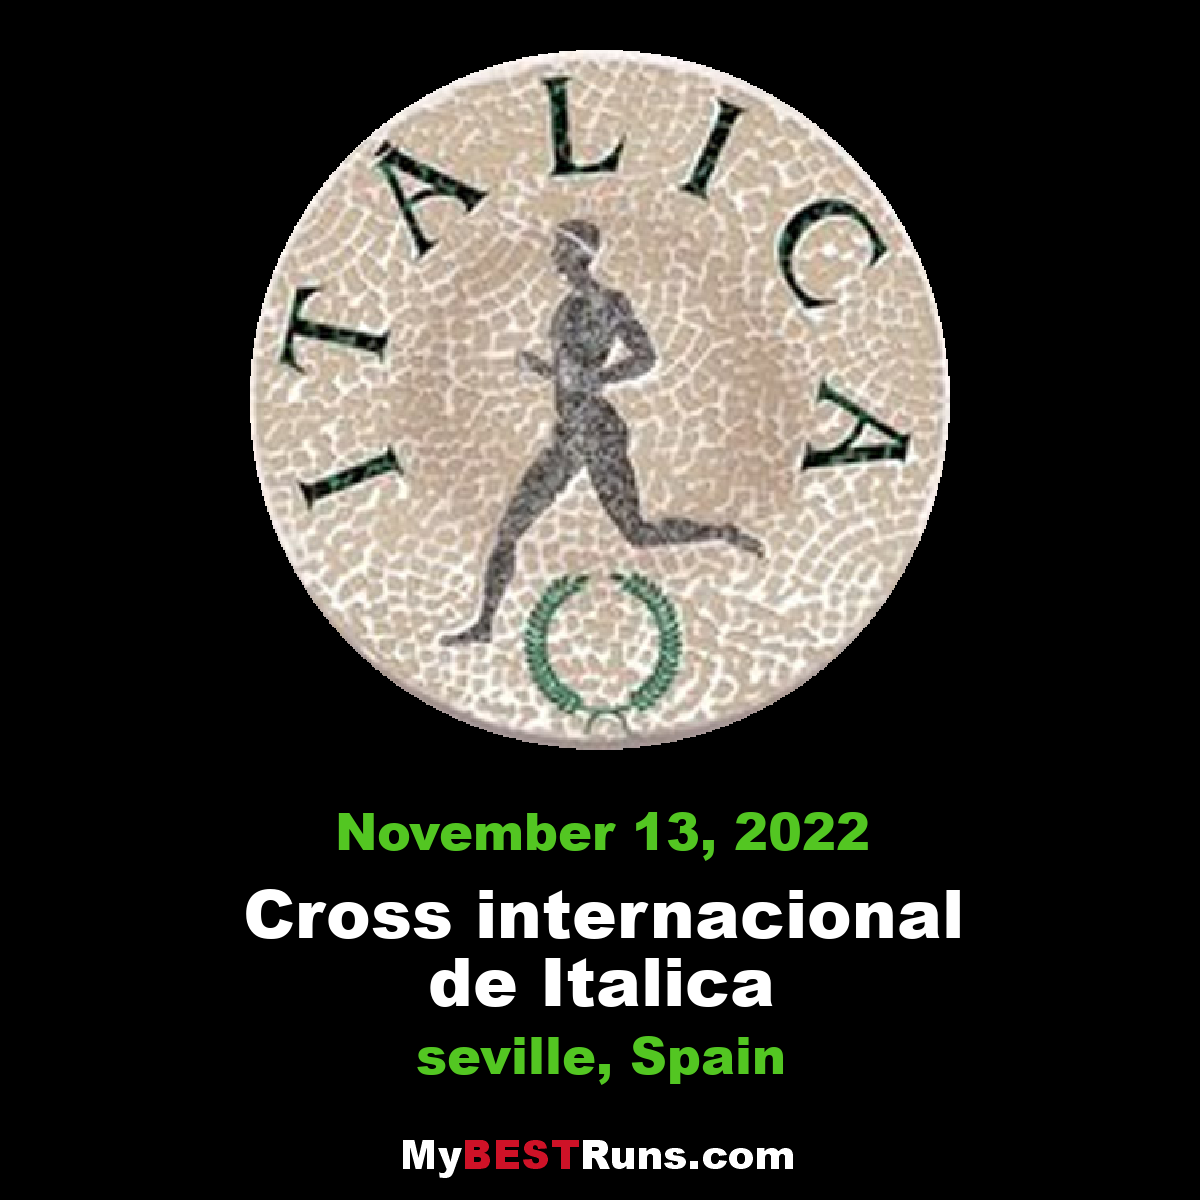 Cross internacional de Italica